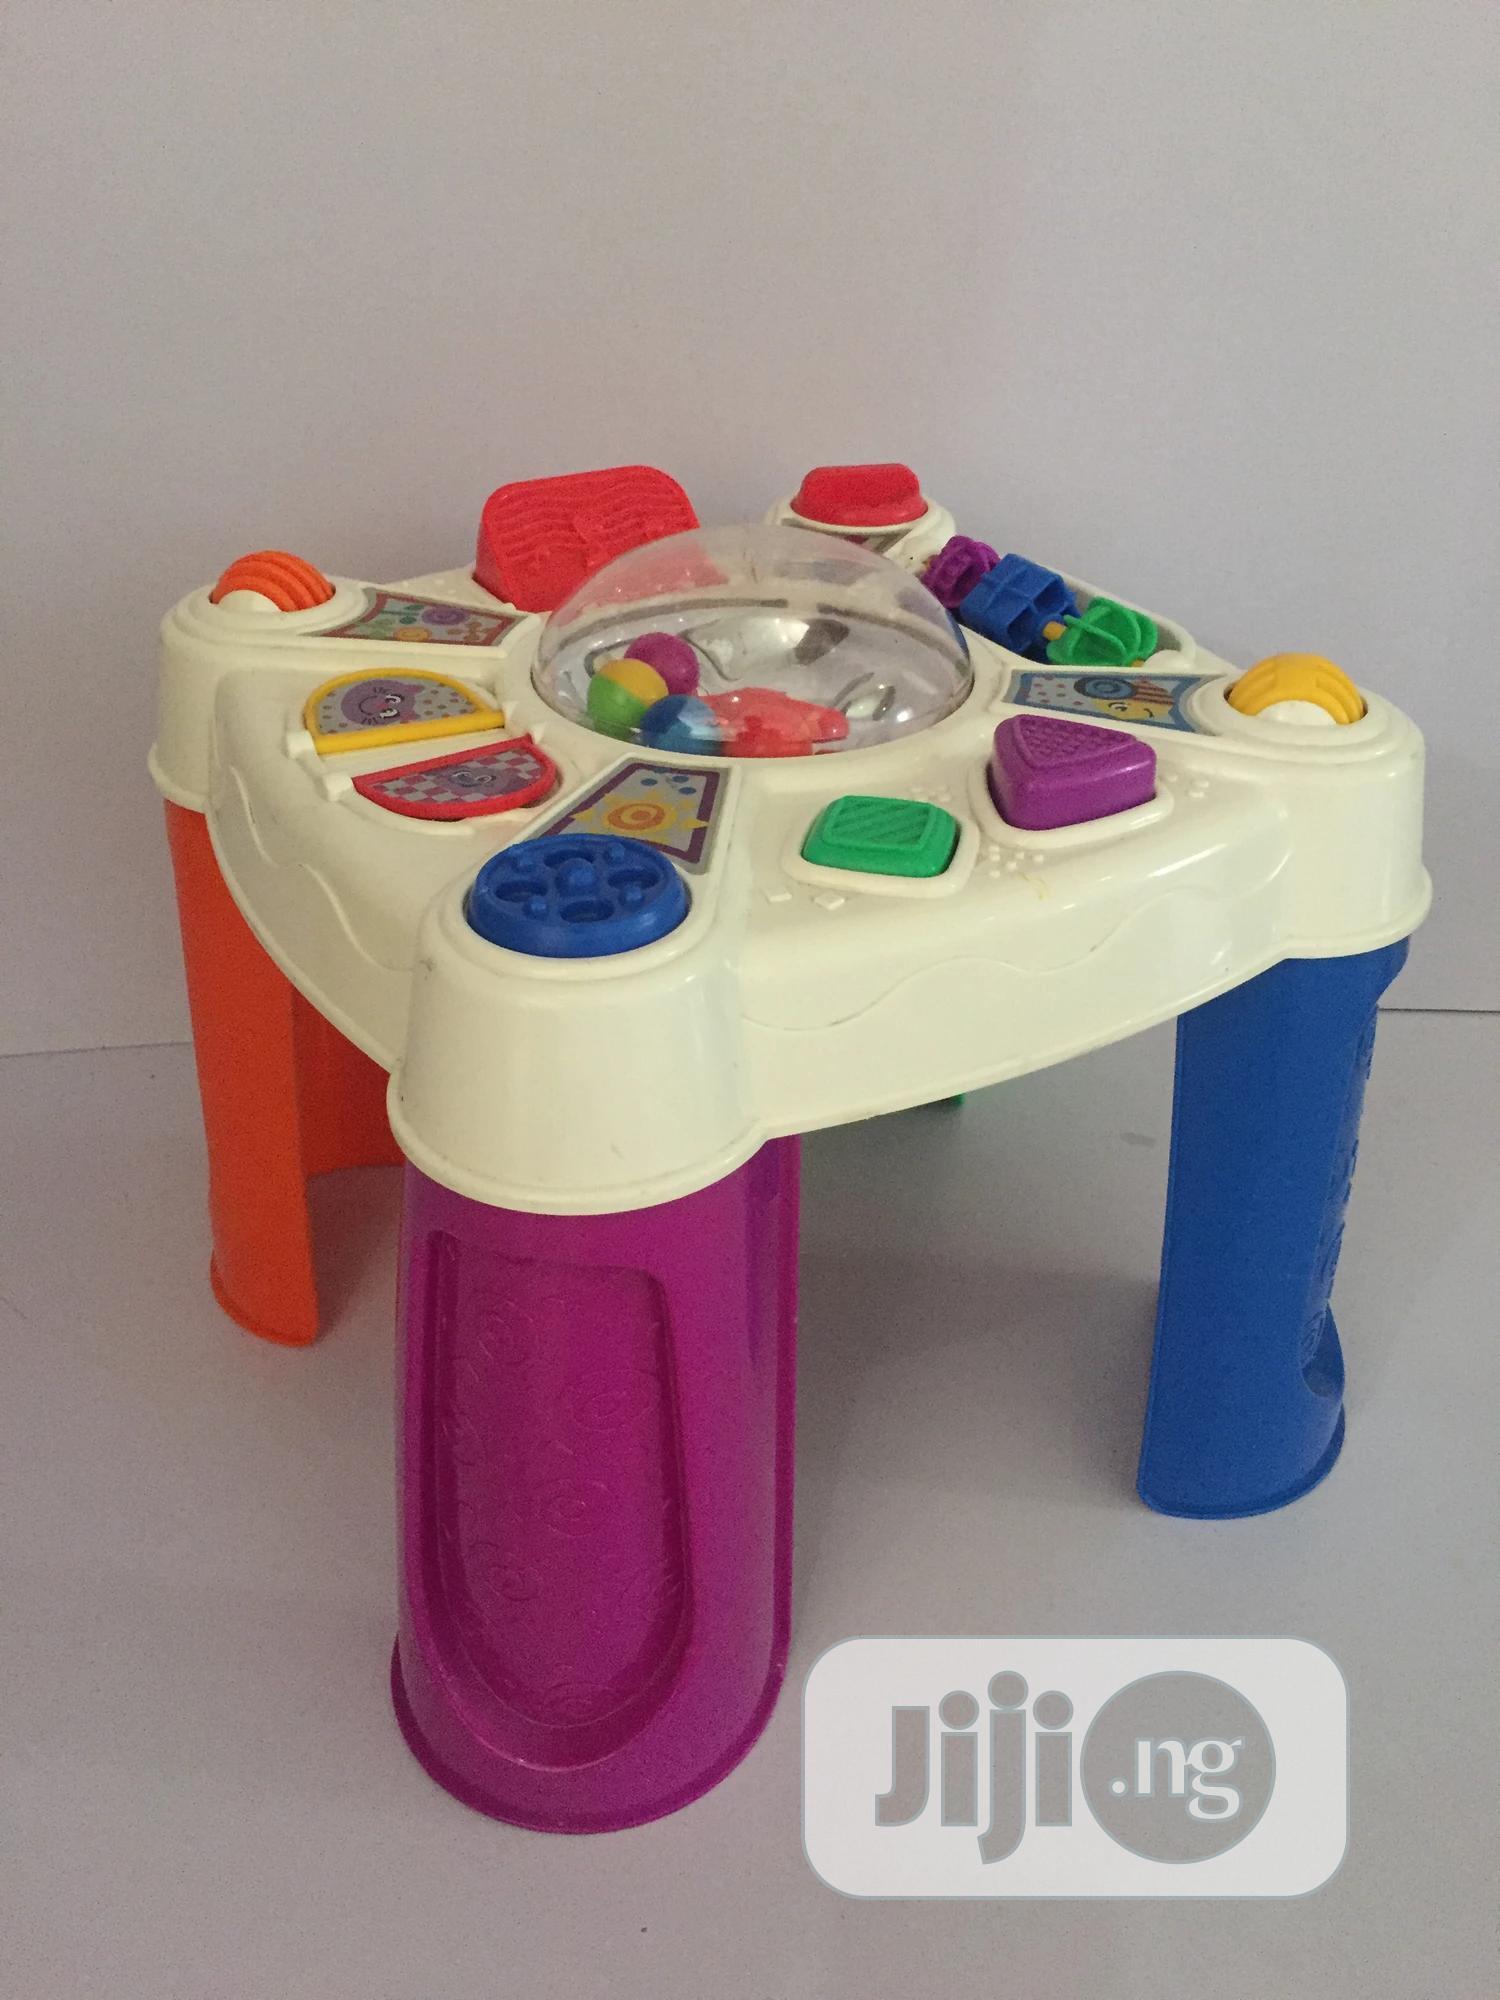 Educational Kids Learning Table Fun